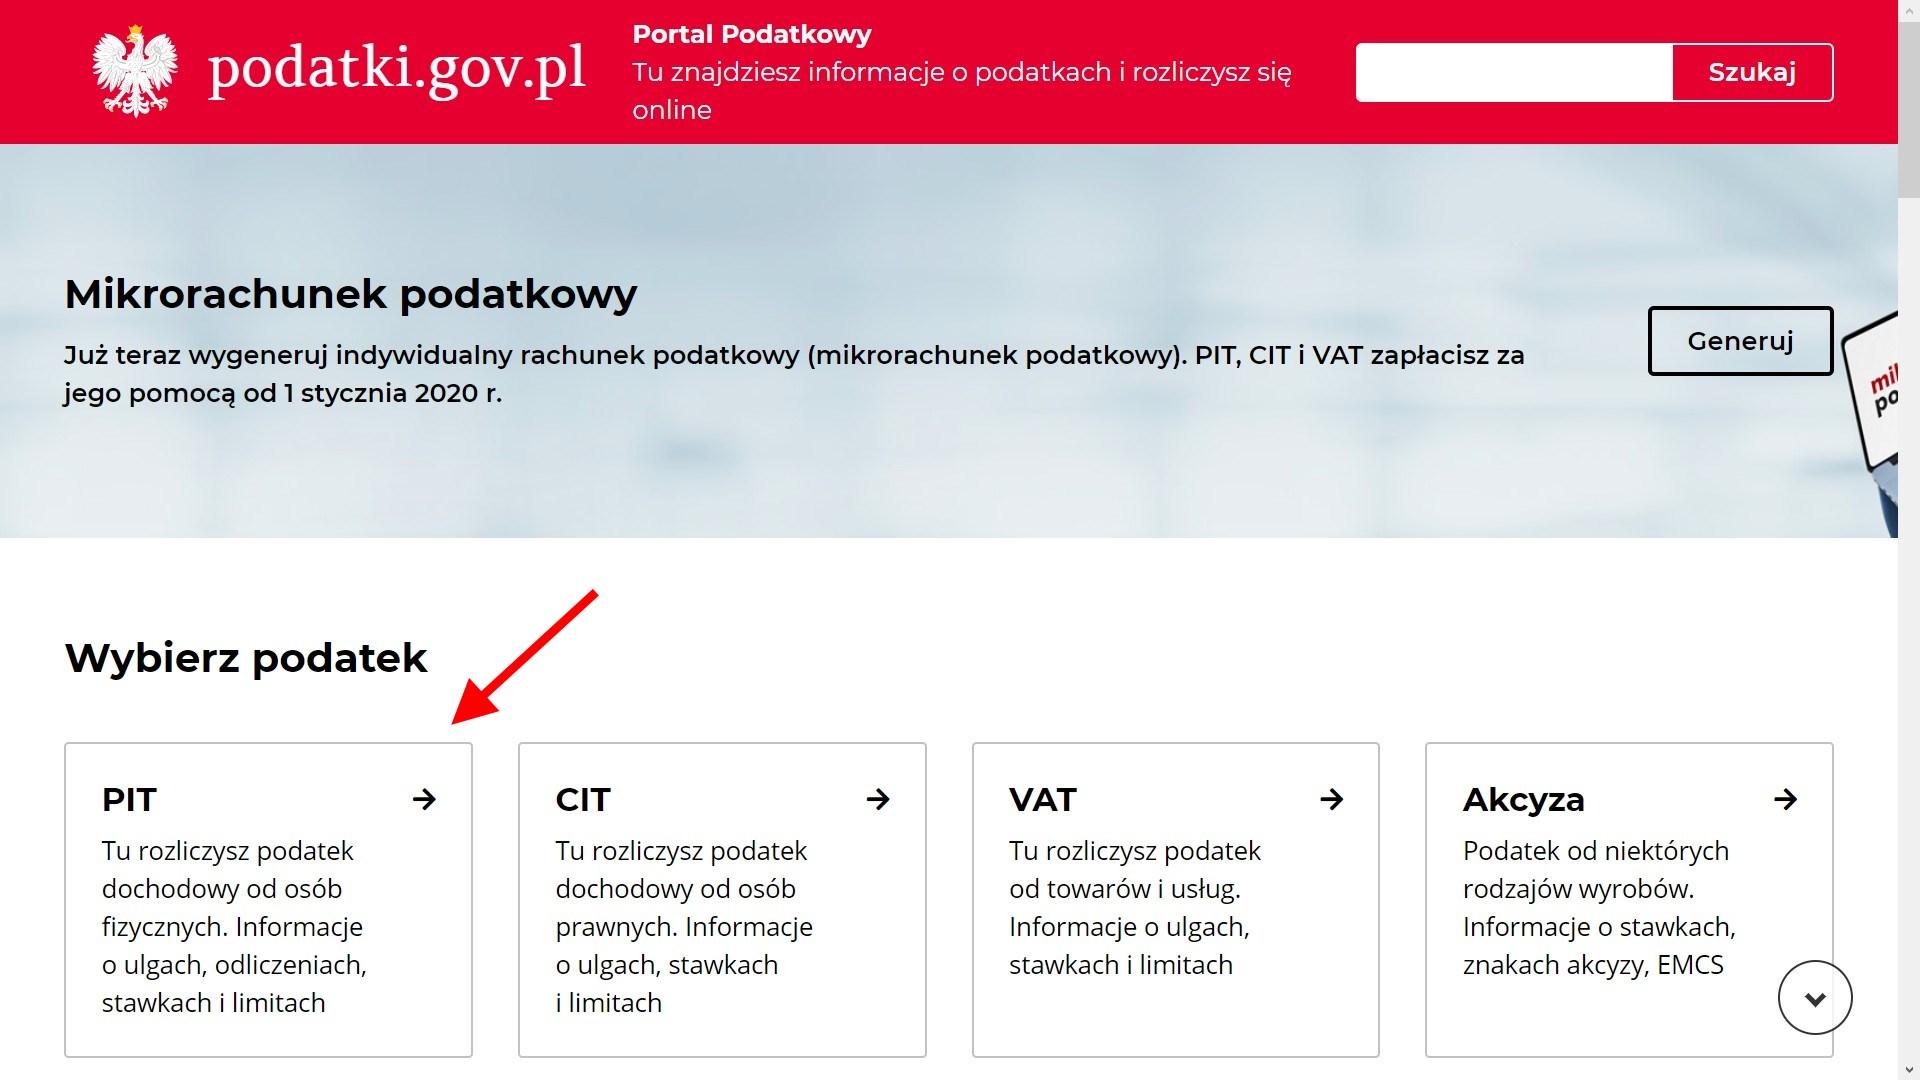 Portal podatkowy PIT